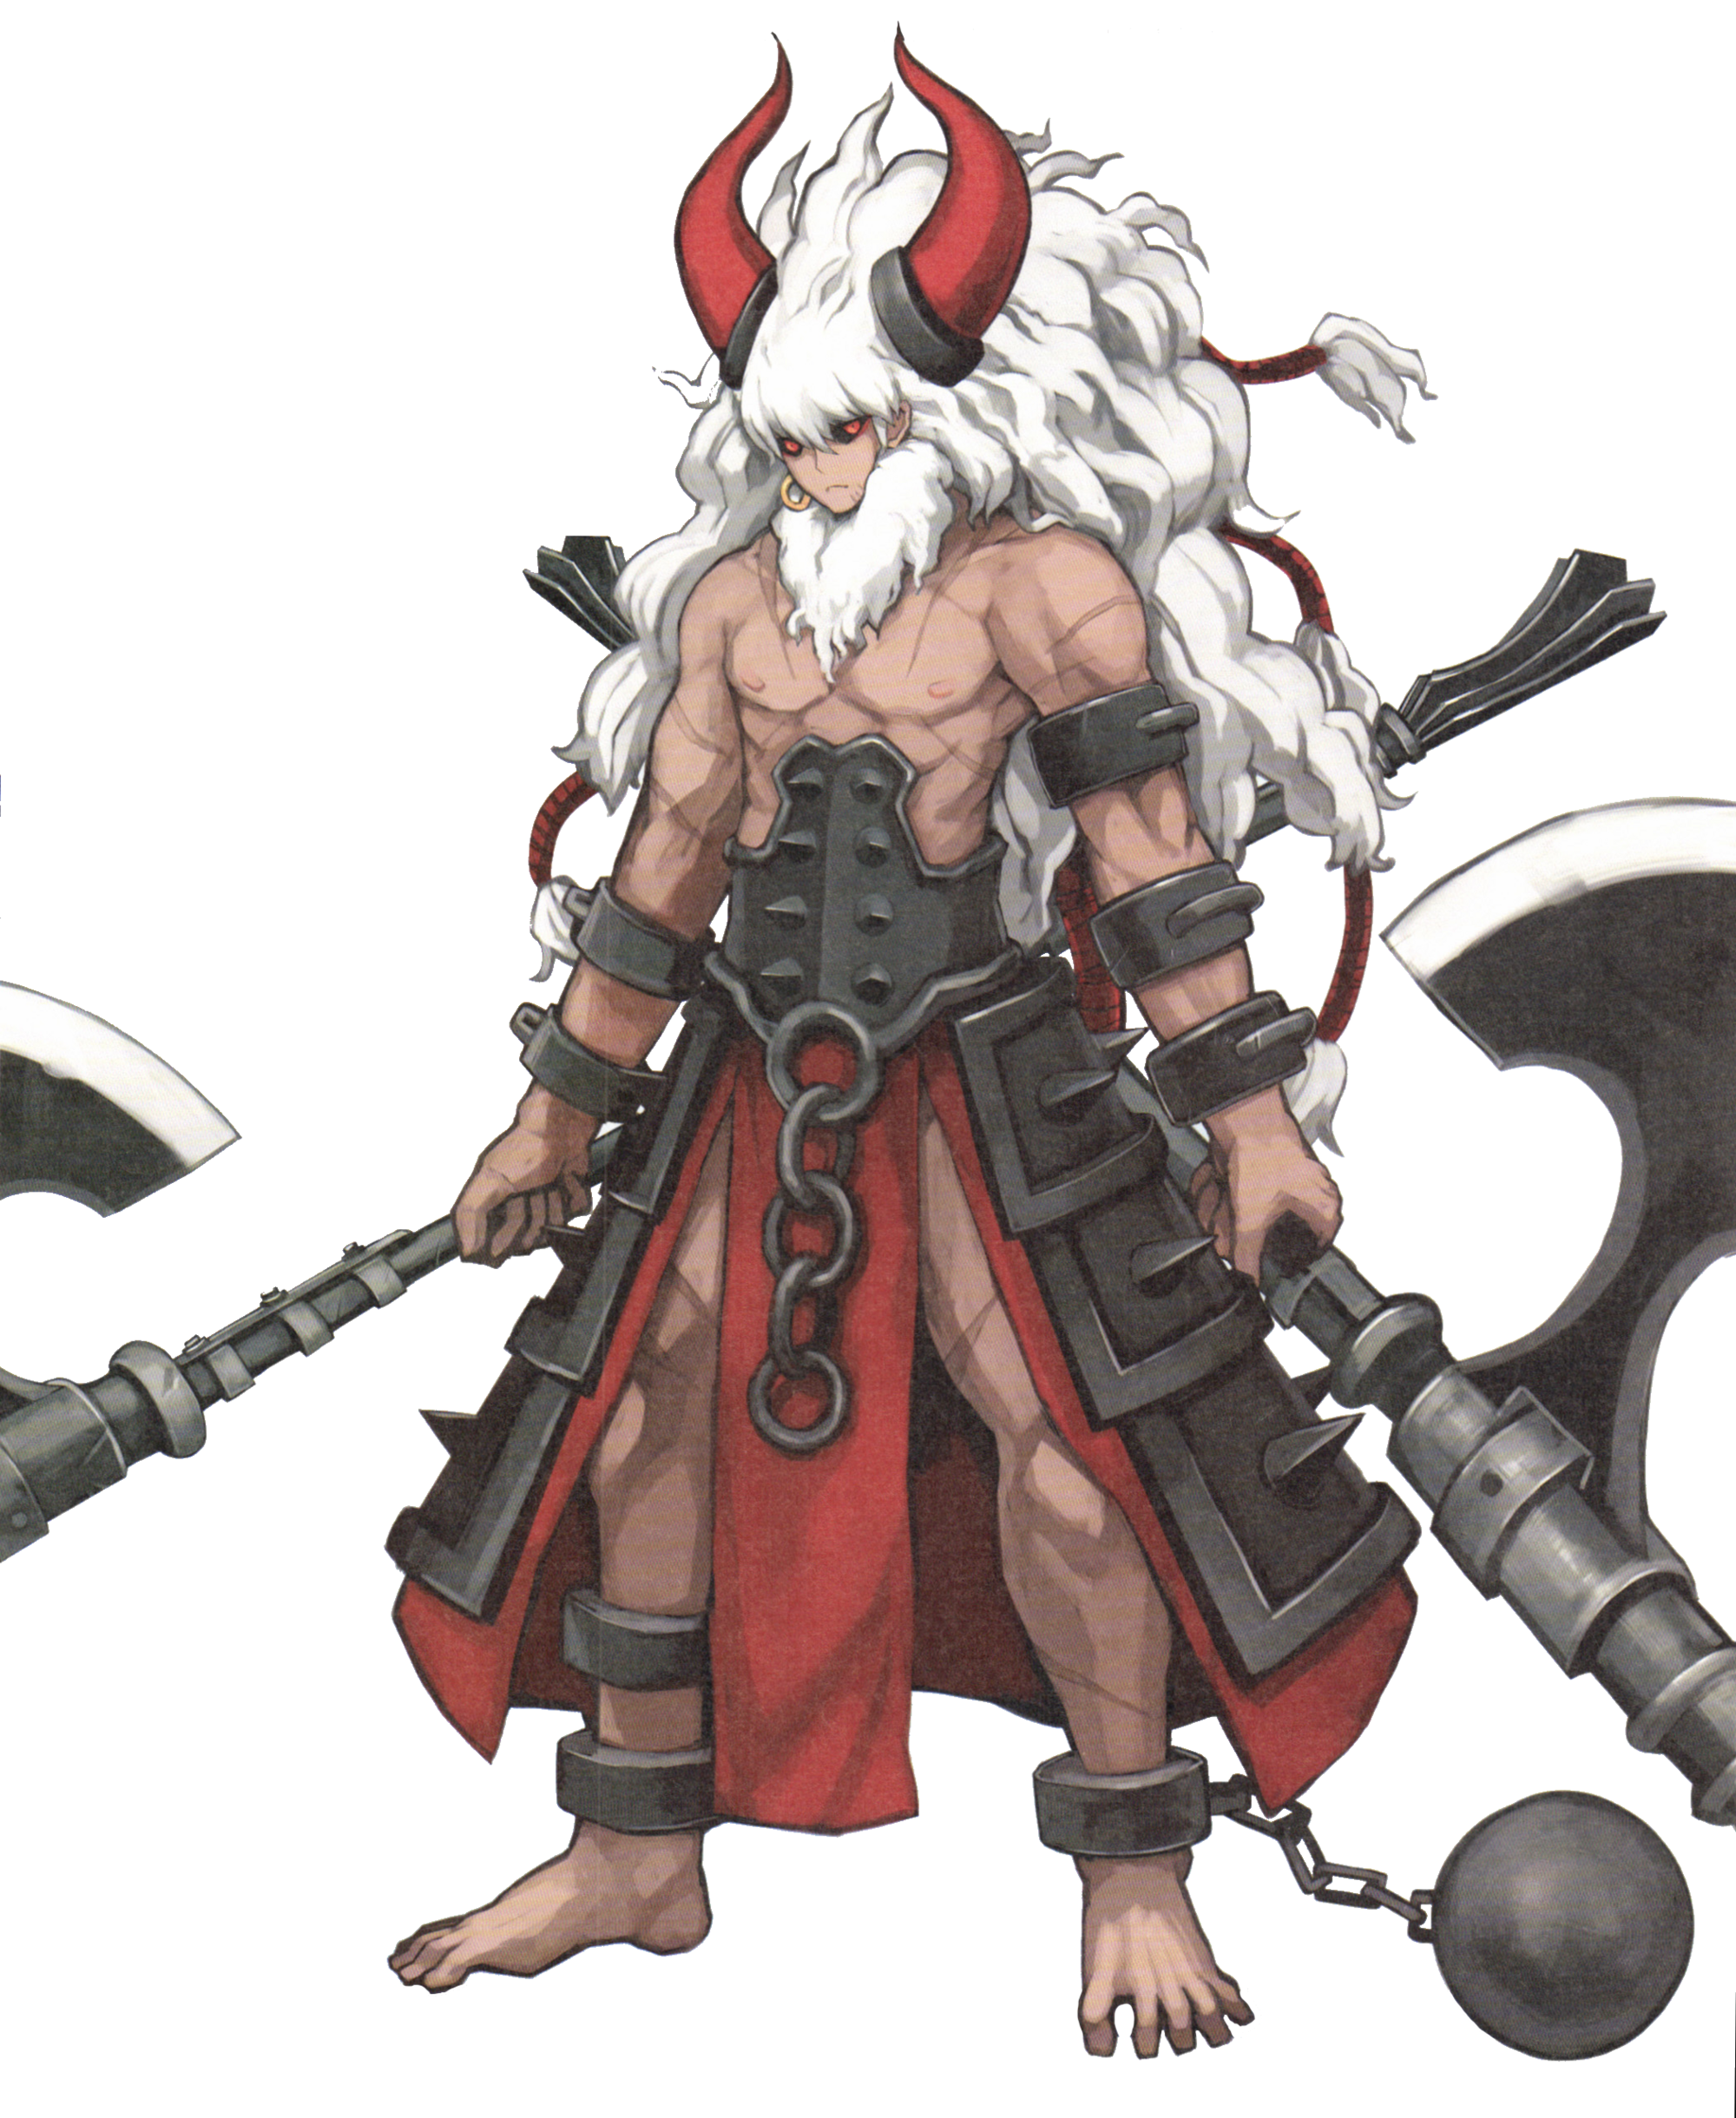 Berserker (Asterios) | VS Battles Wiki | FANDOM powered by ...